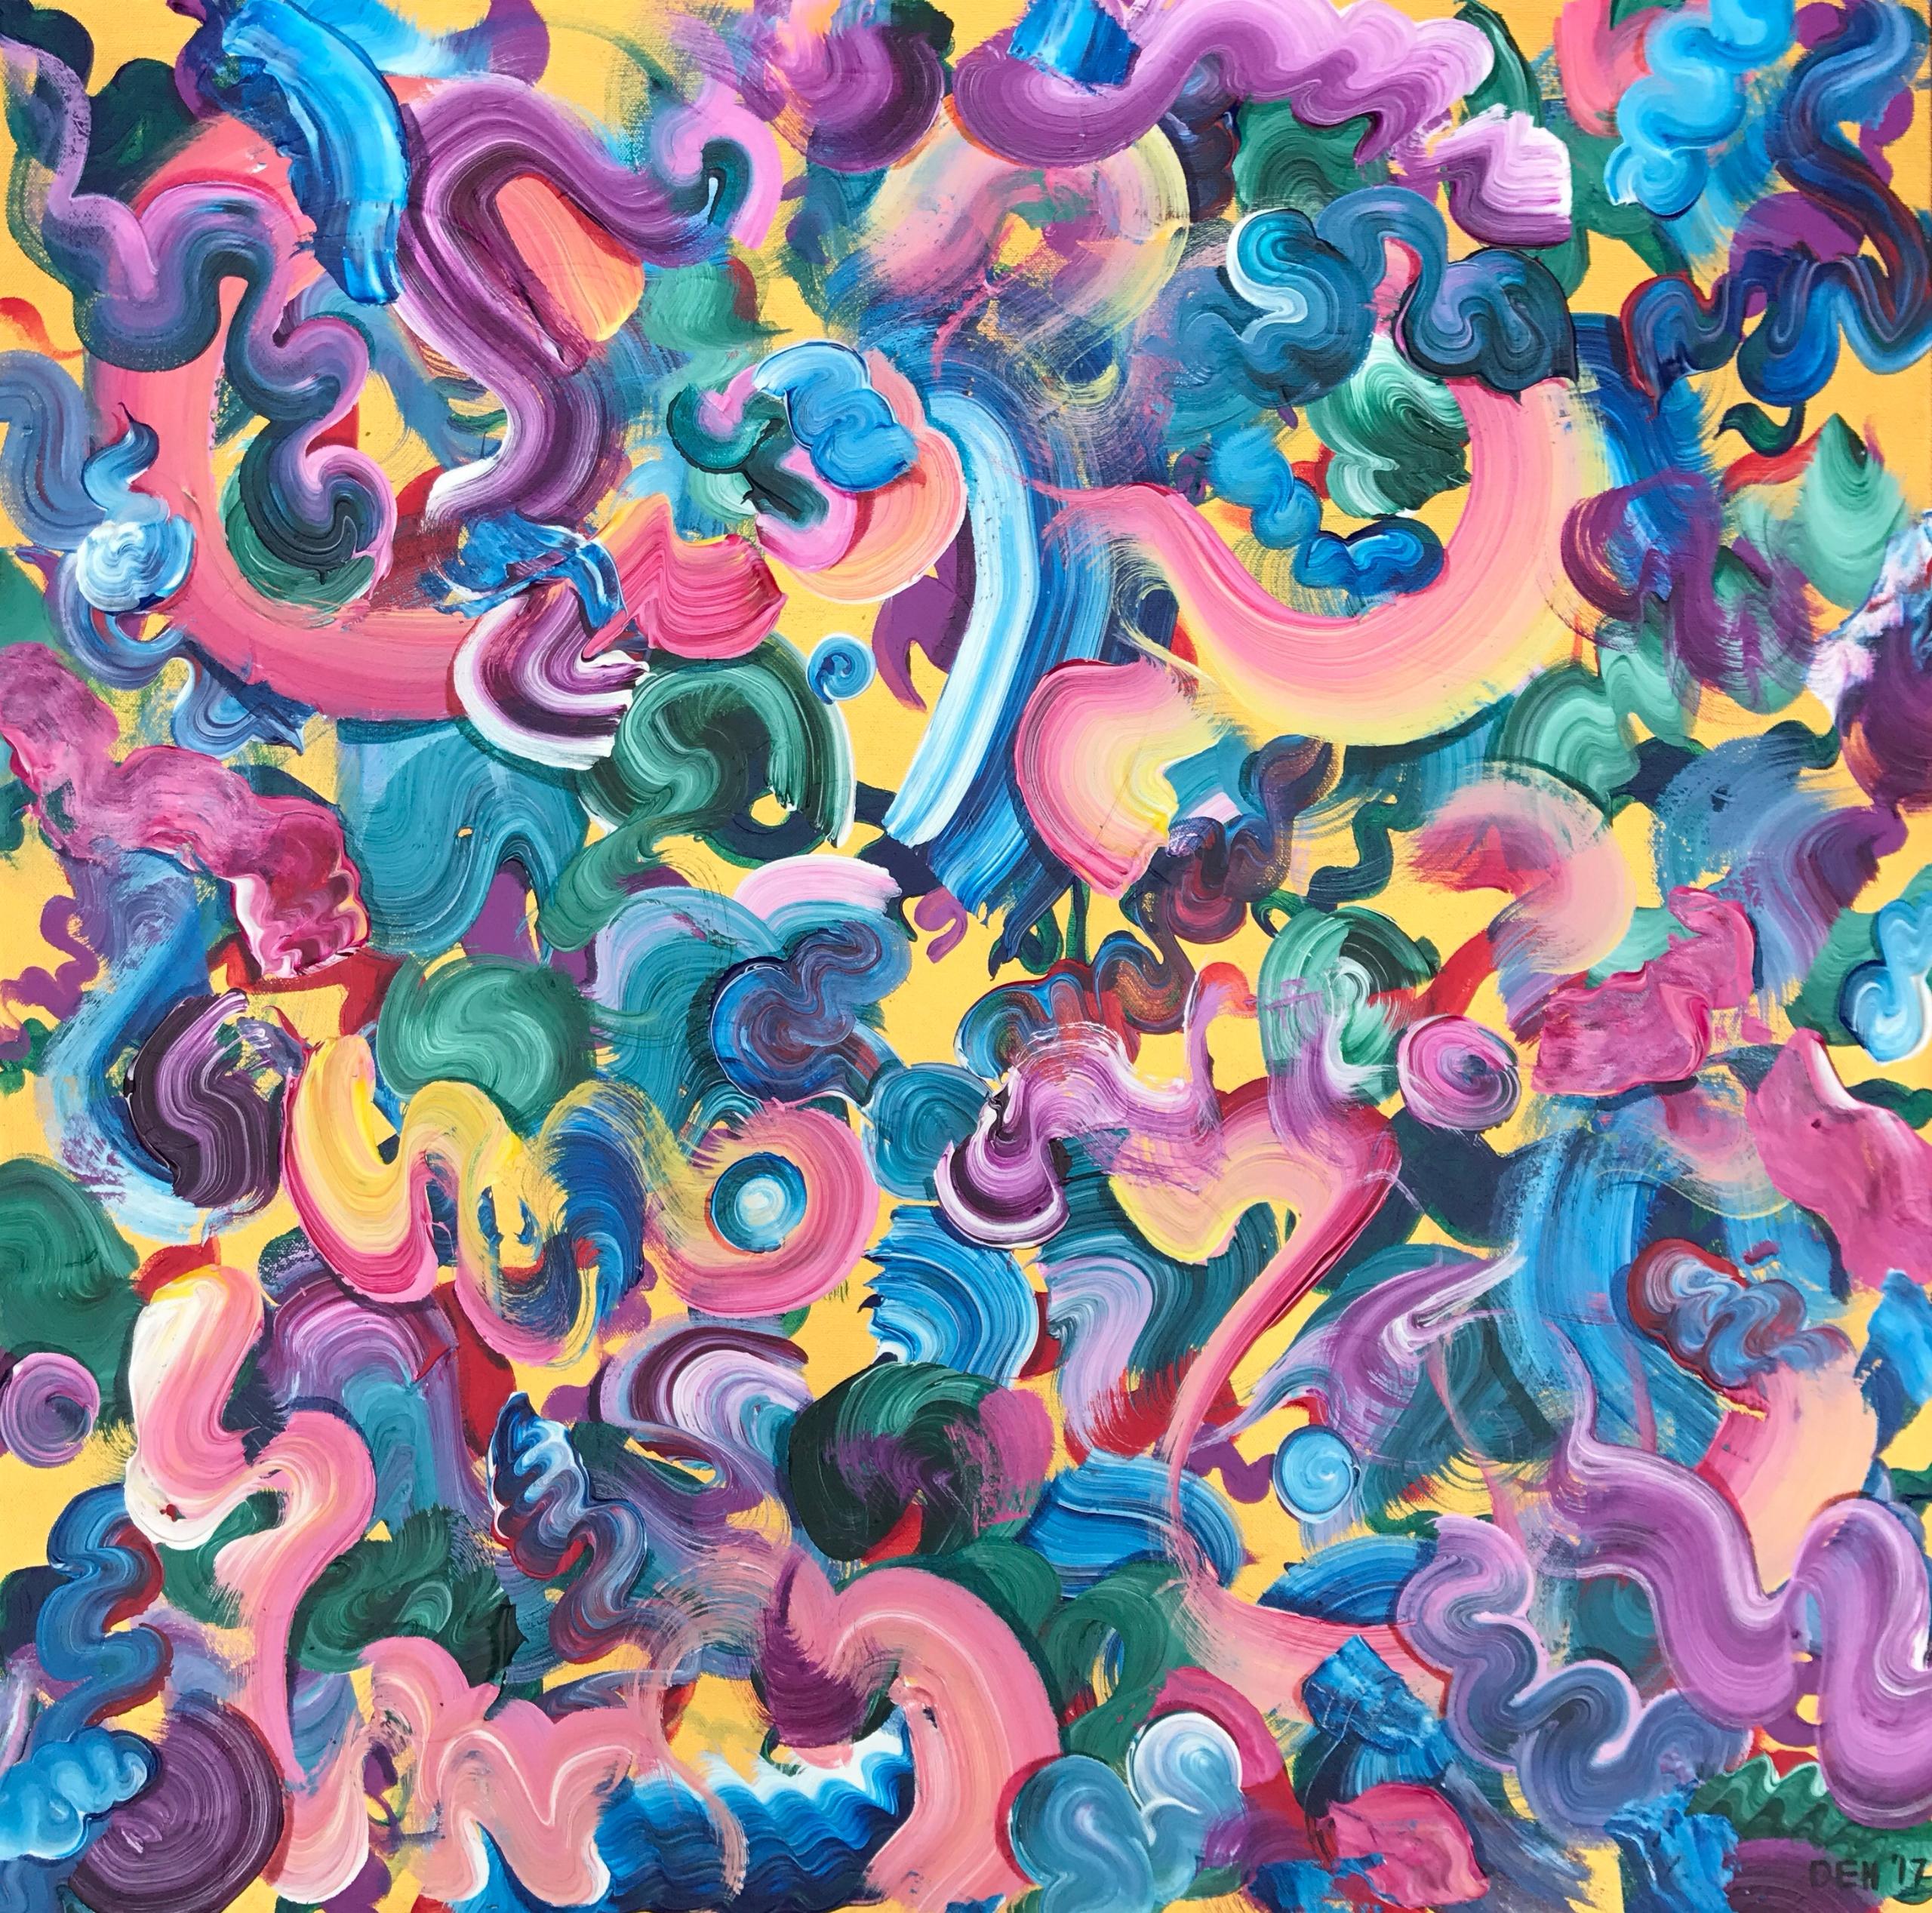 Ello! paintings combine natural - dhuston | ello